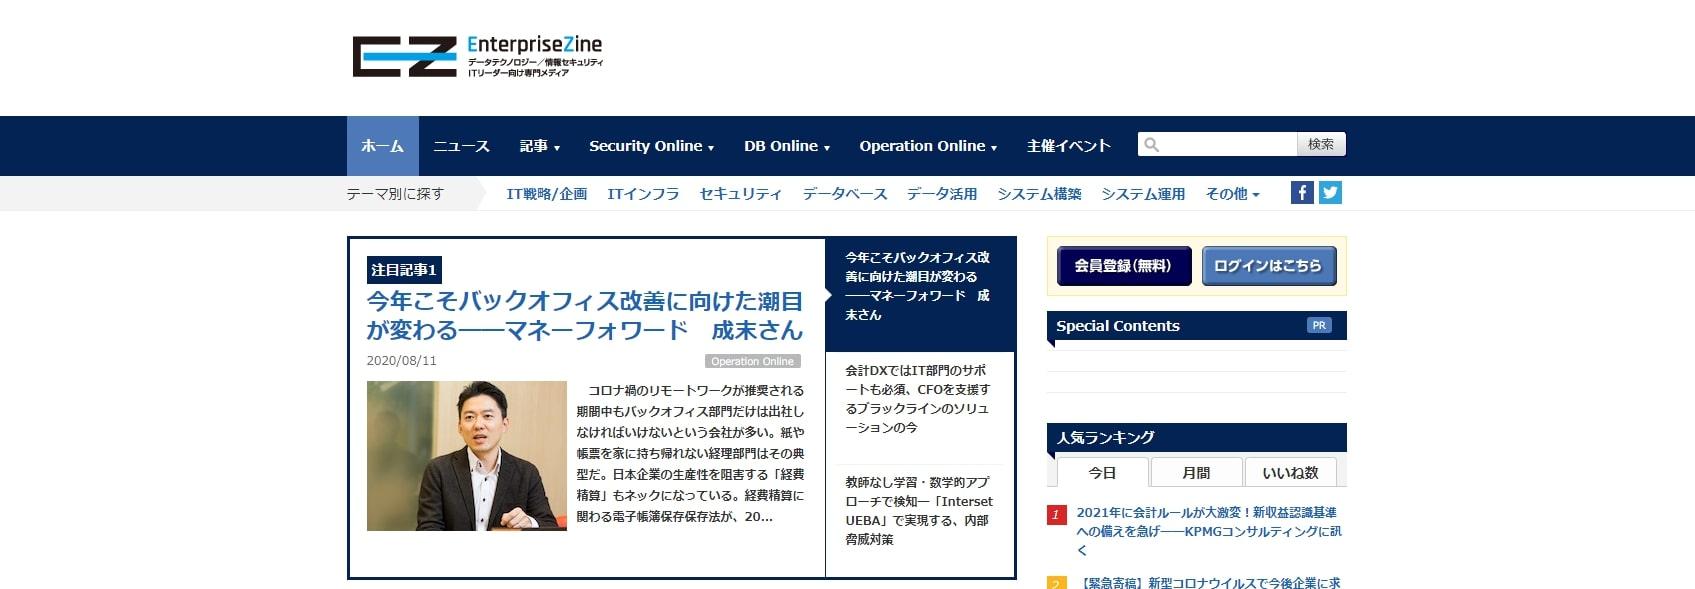 EnterpriseZine(エンタープライズジン)